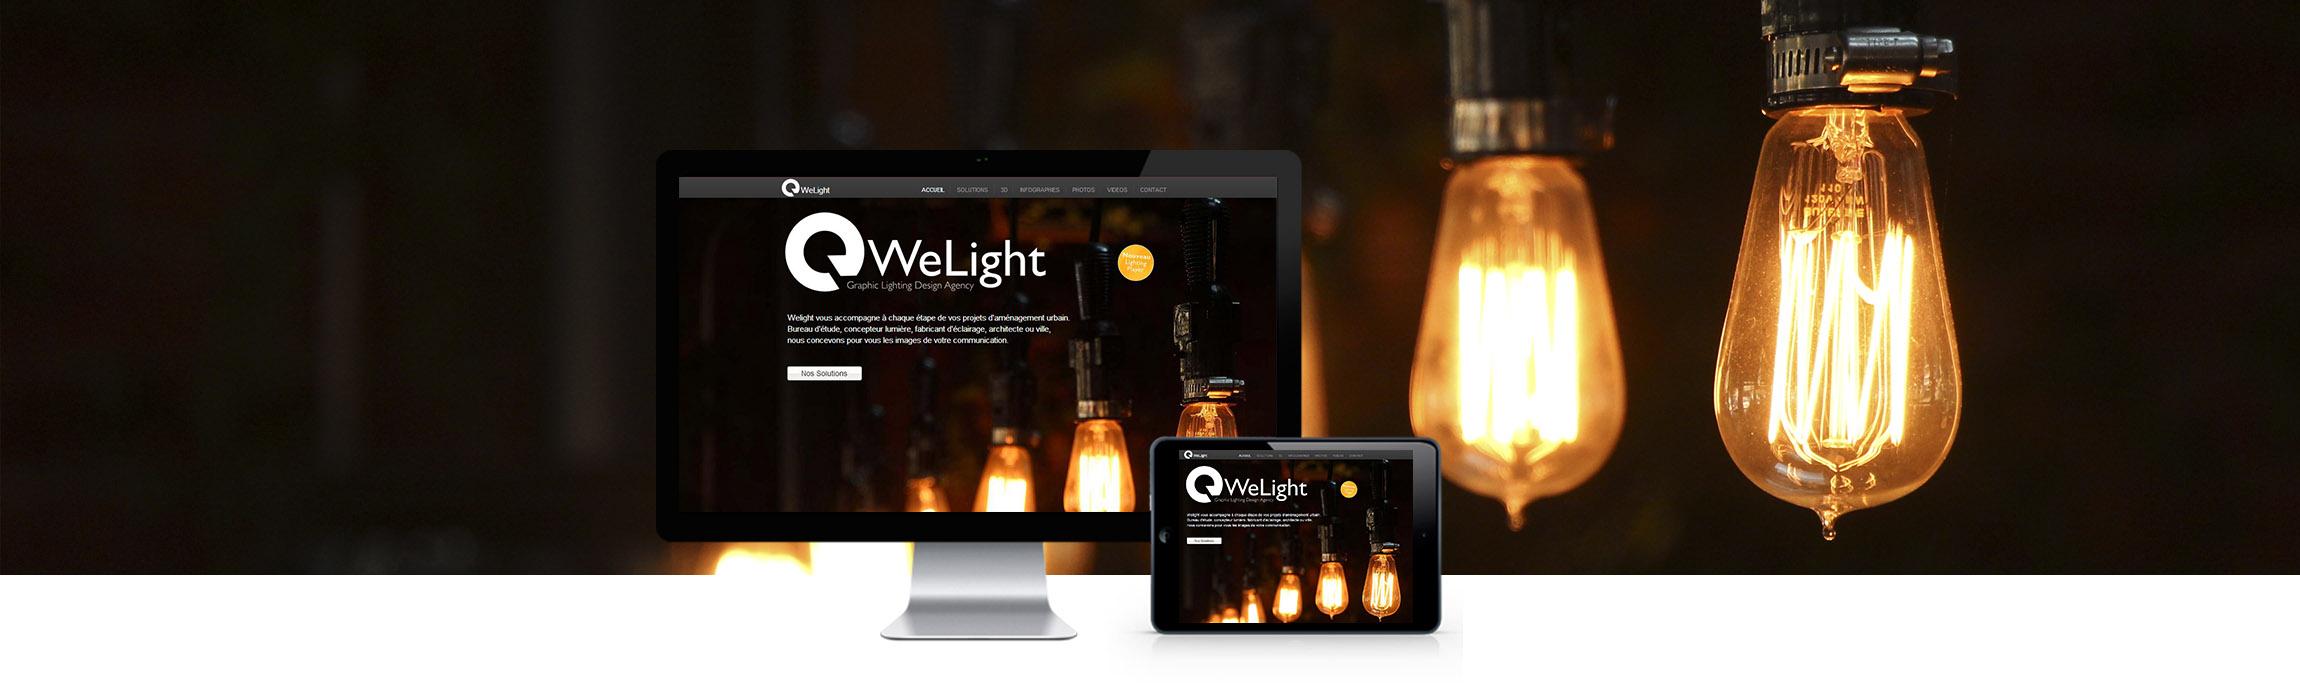 WWW.WELIGHT.COM